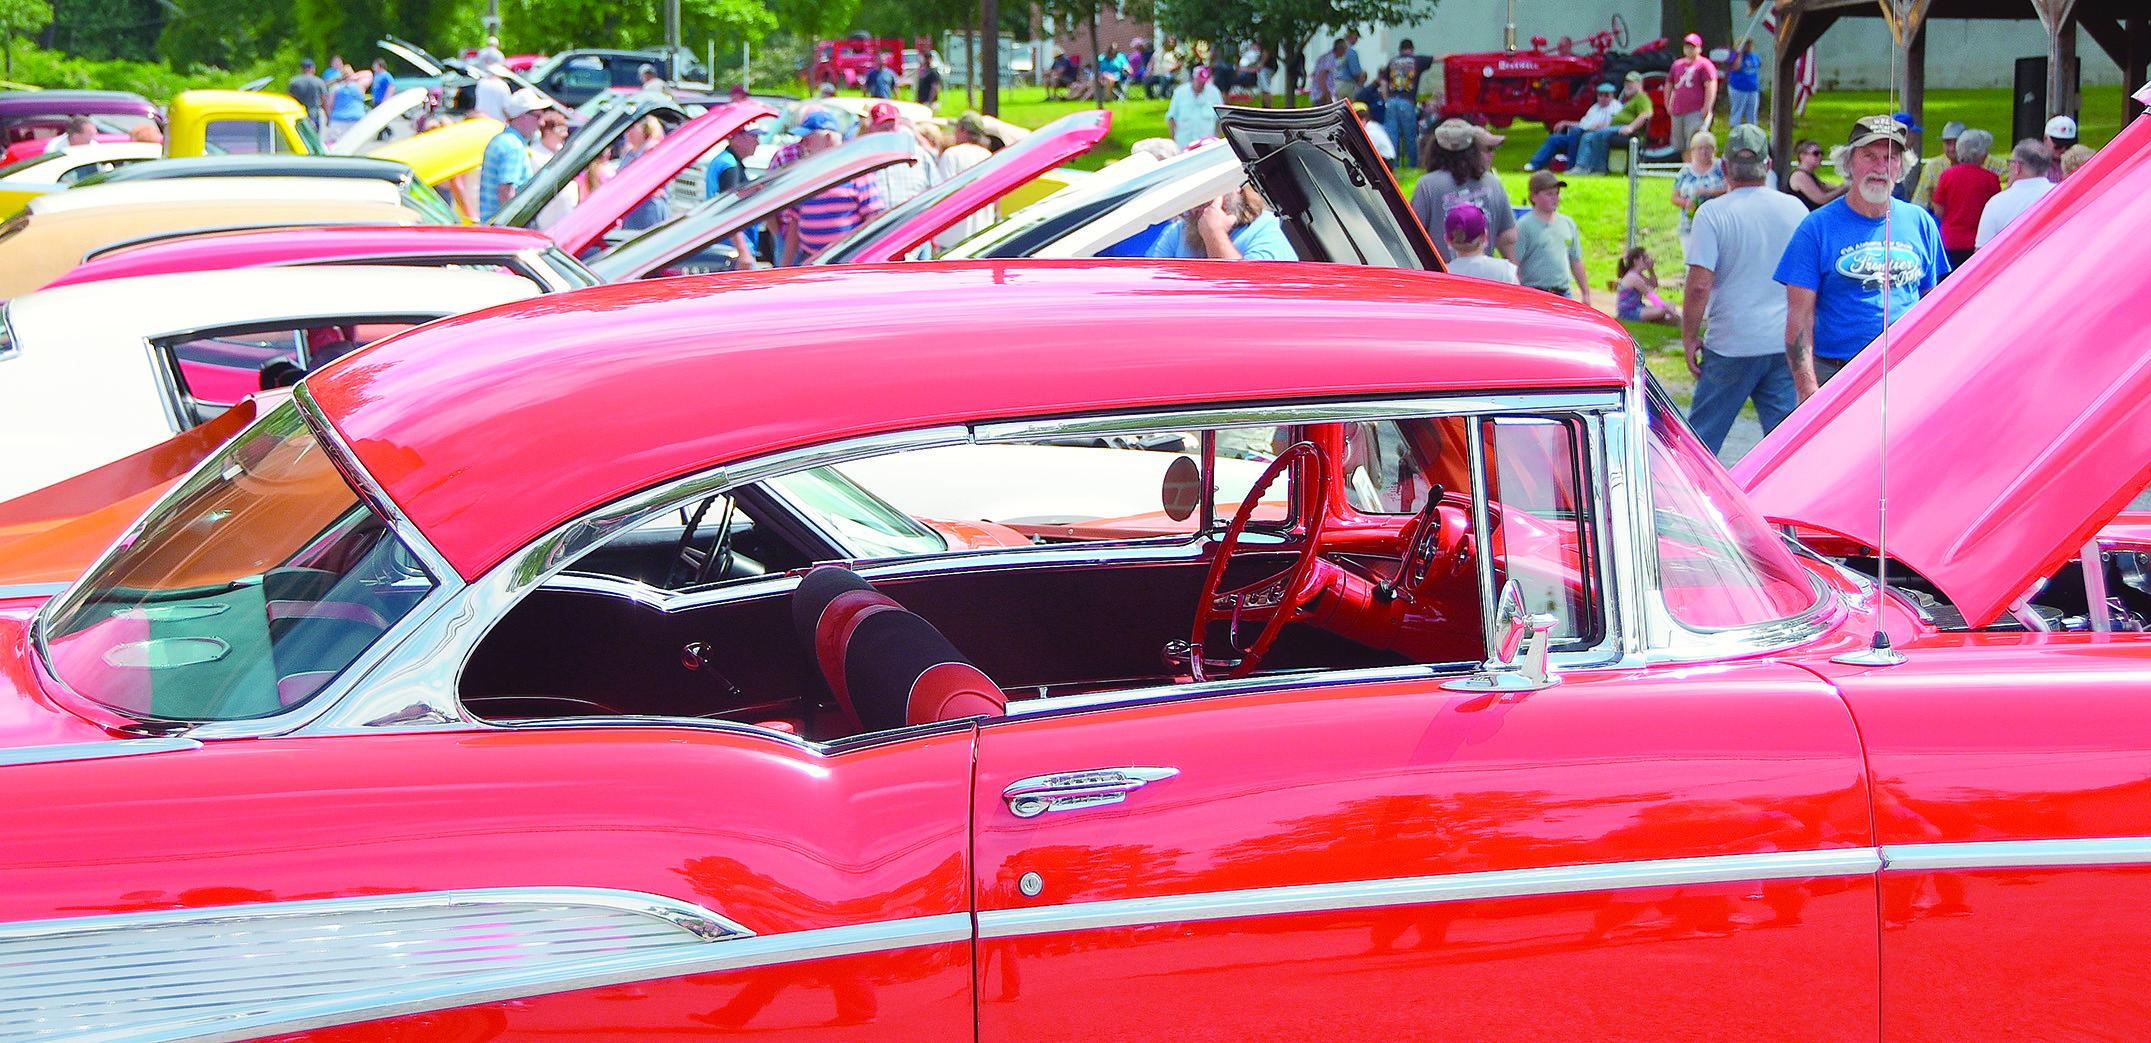 Rd Nauvoo Car Show Set For June Daily Mountain Eagle - Next car show near me